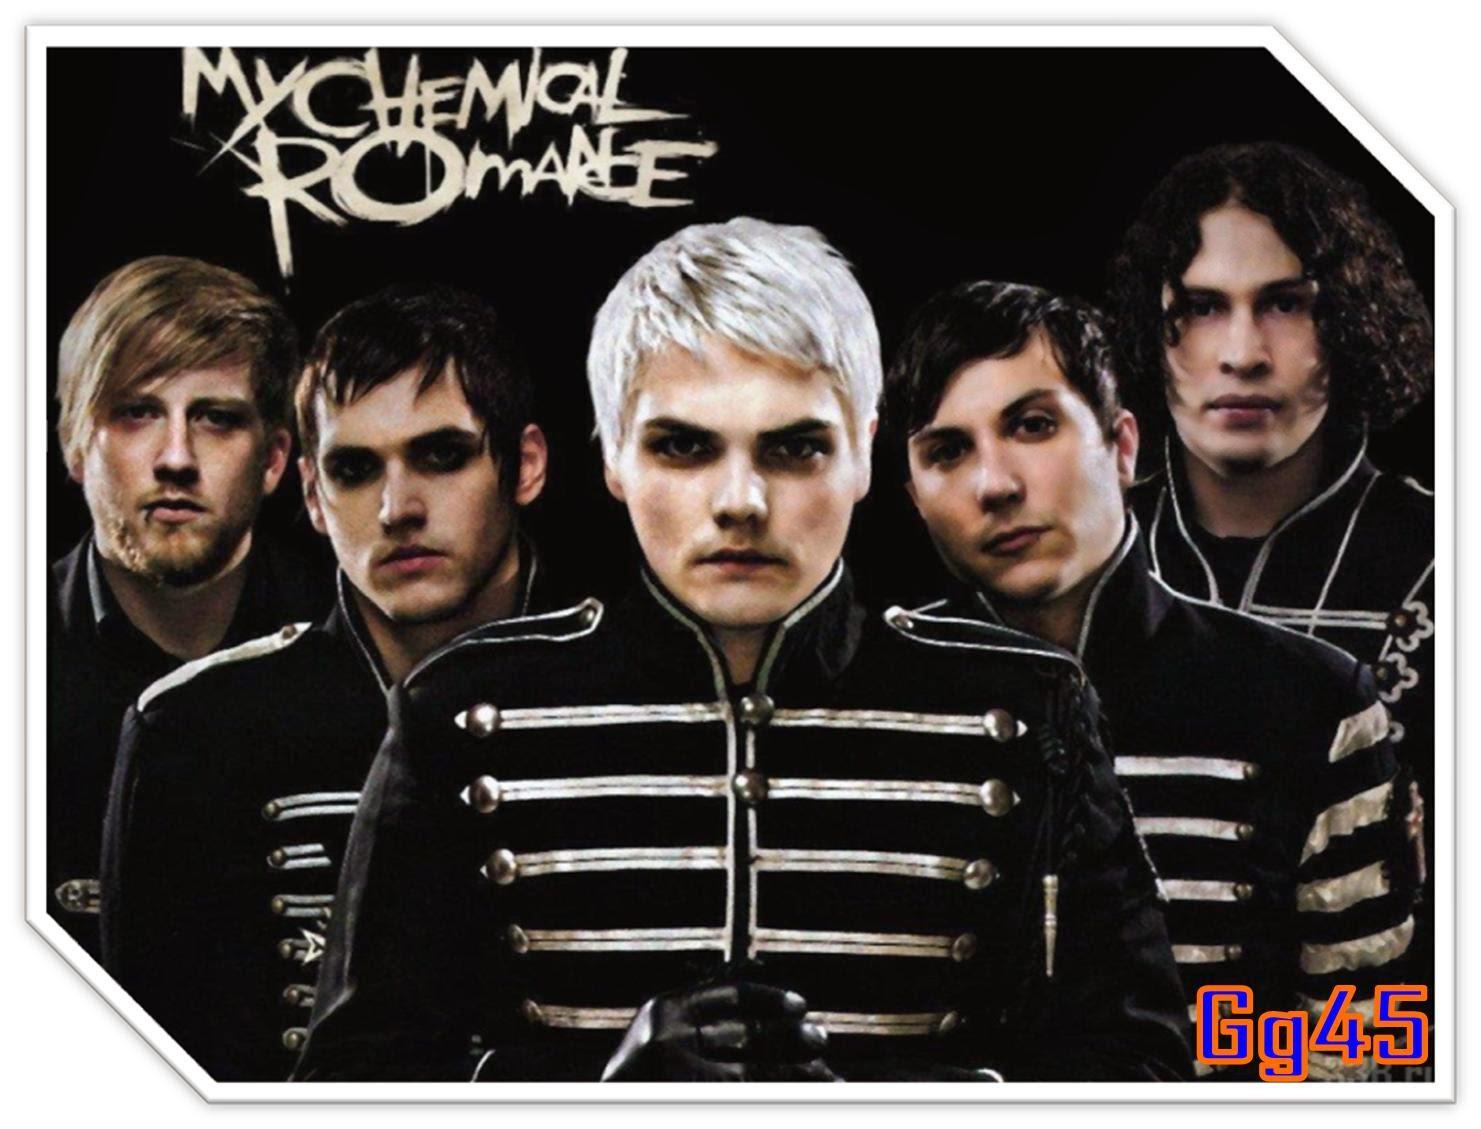 Download Kumpulan Lagu My Chemical Romance Lengkap